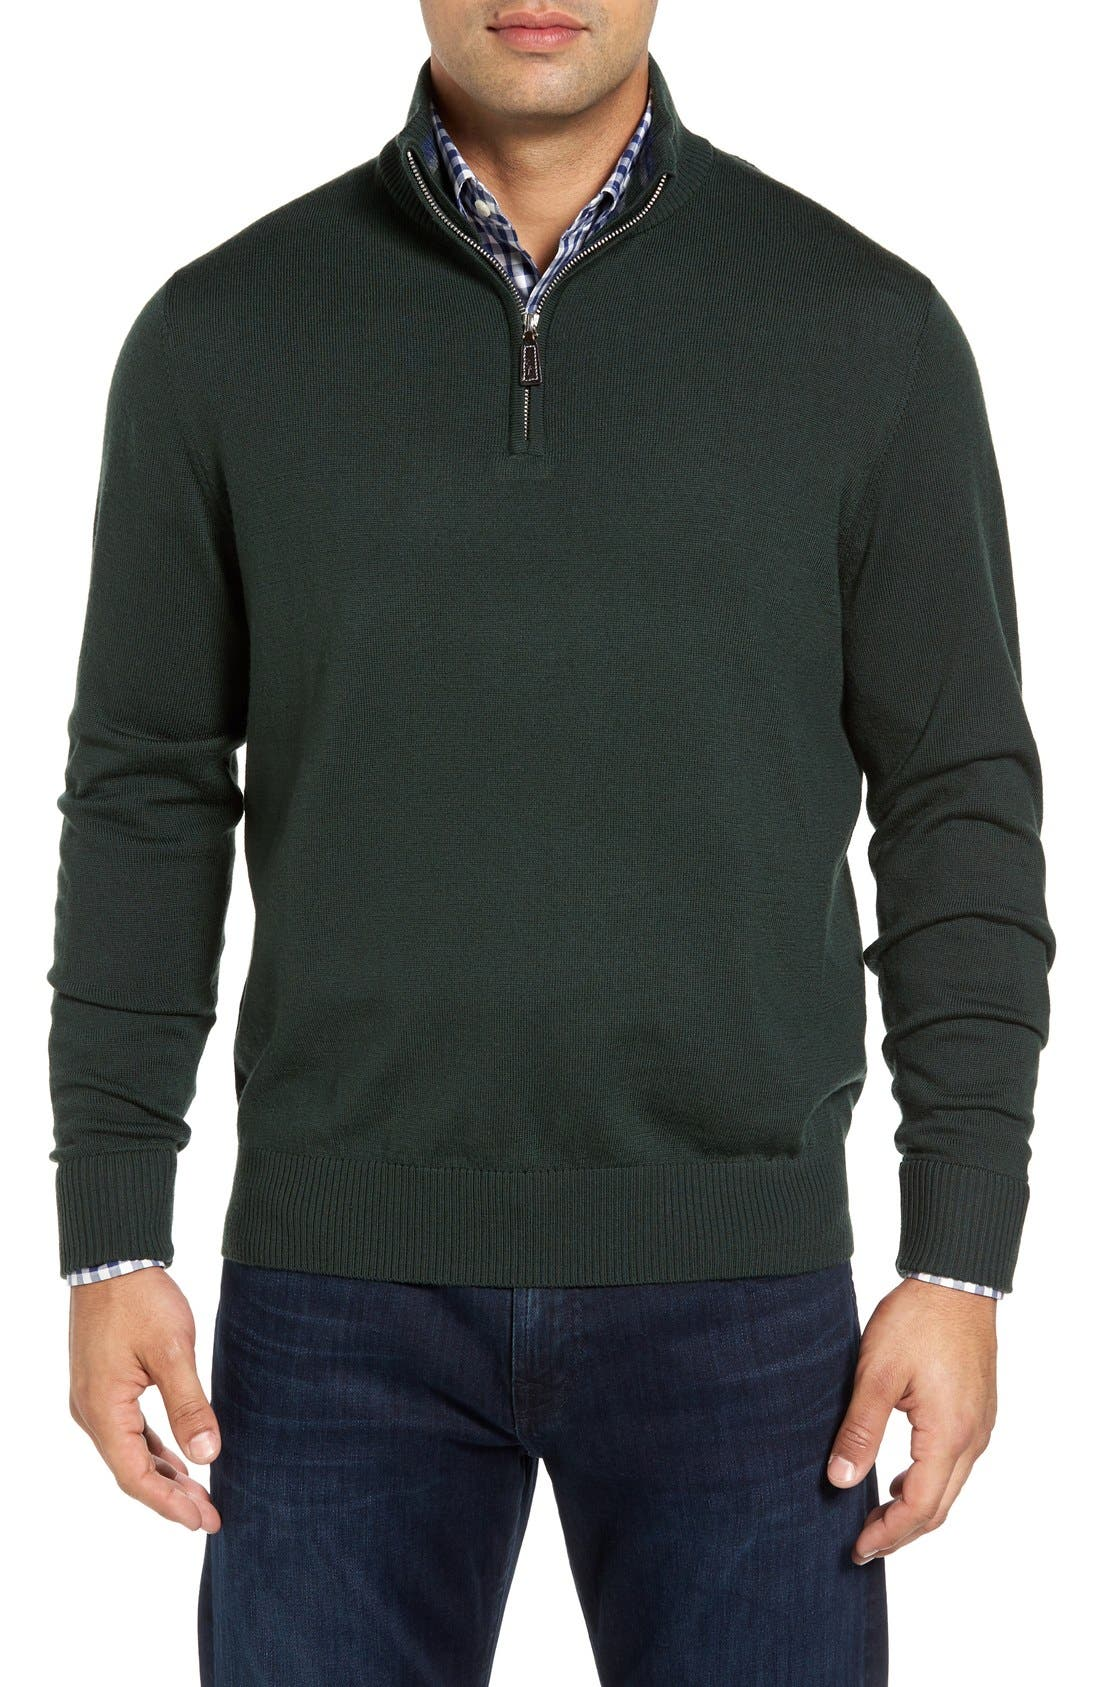 TailorByrd S.Cascade Quarter Zip Wool Sweater